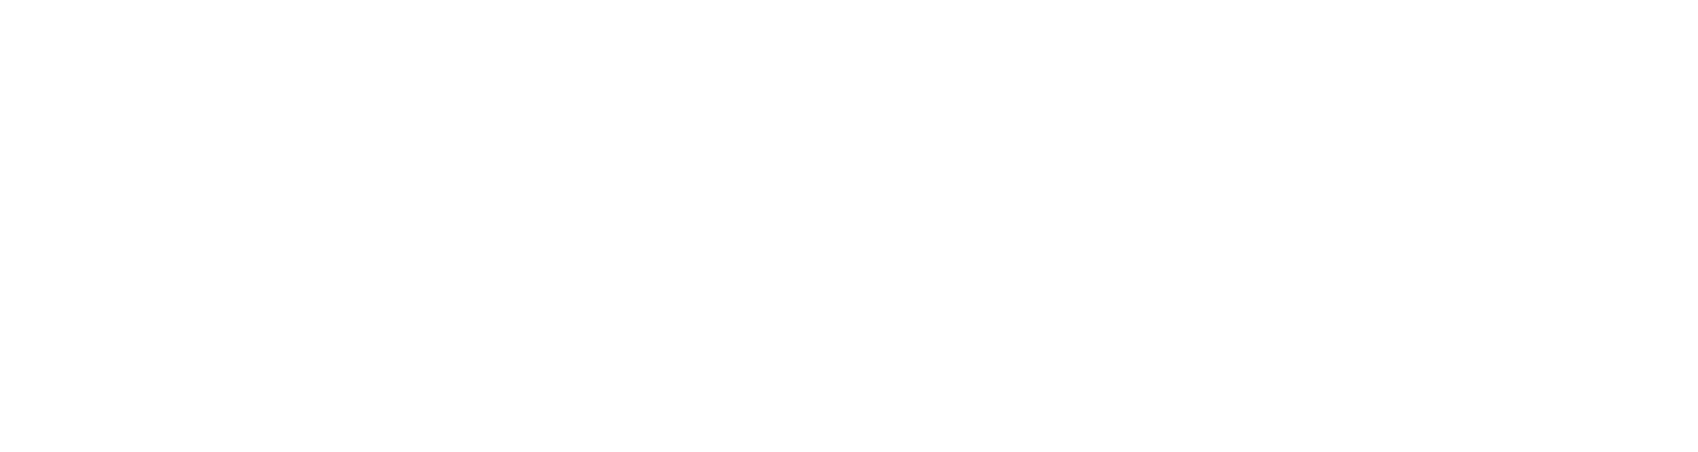 tc bodman ludwigshafen